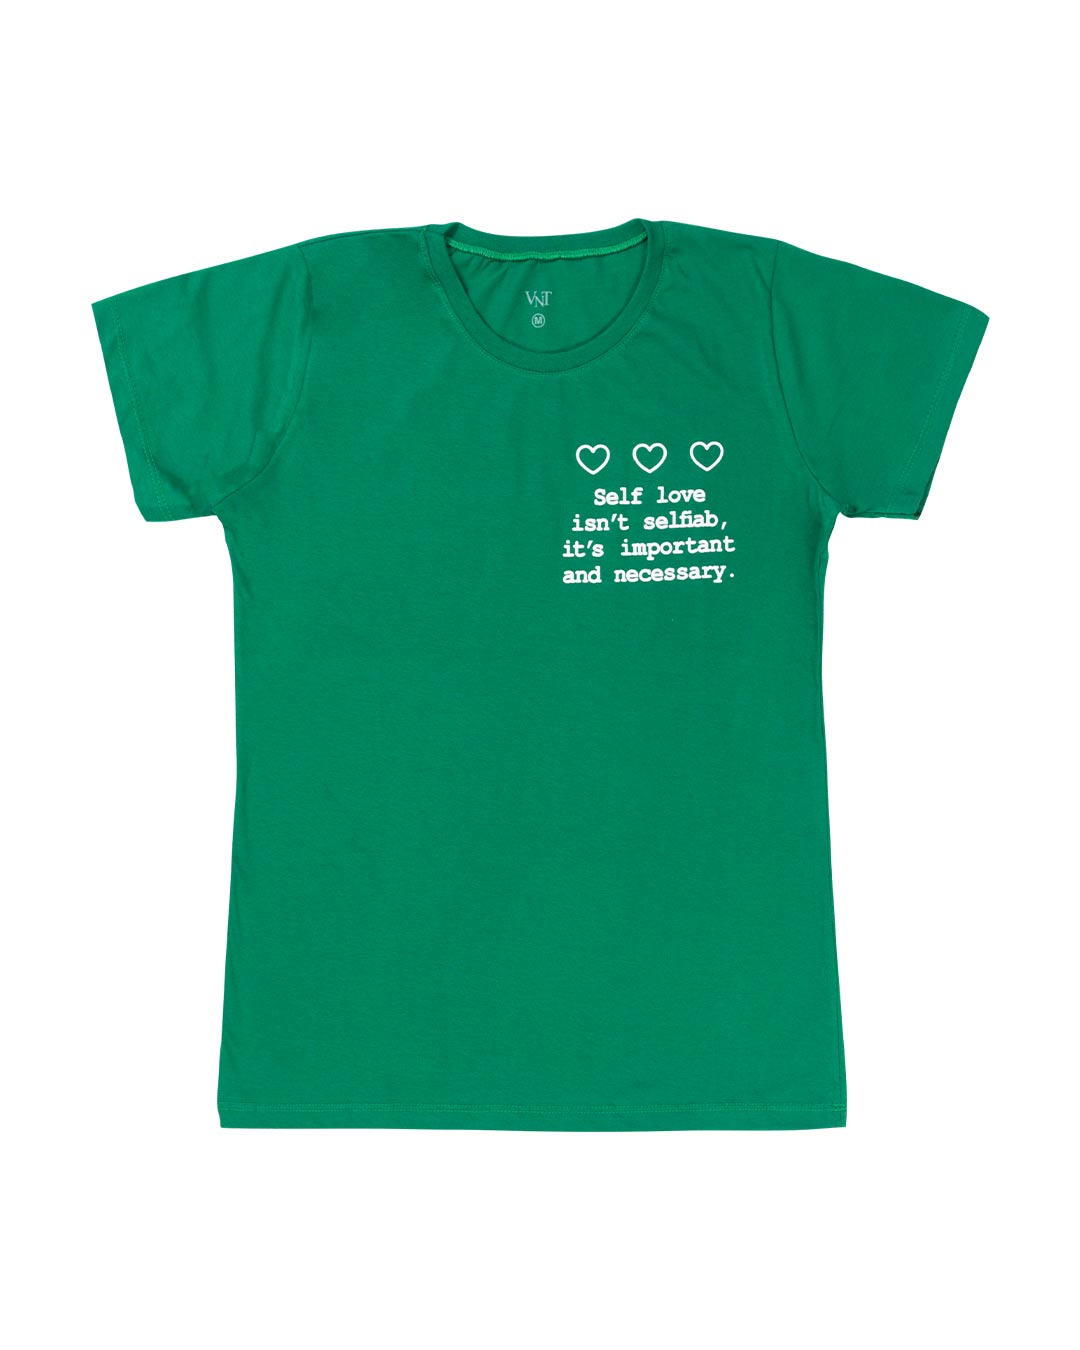 T-Shirt Adulta e Plus Size Self Love - Santa Margô